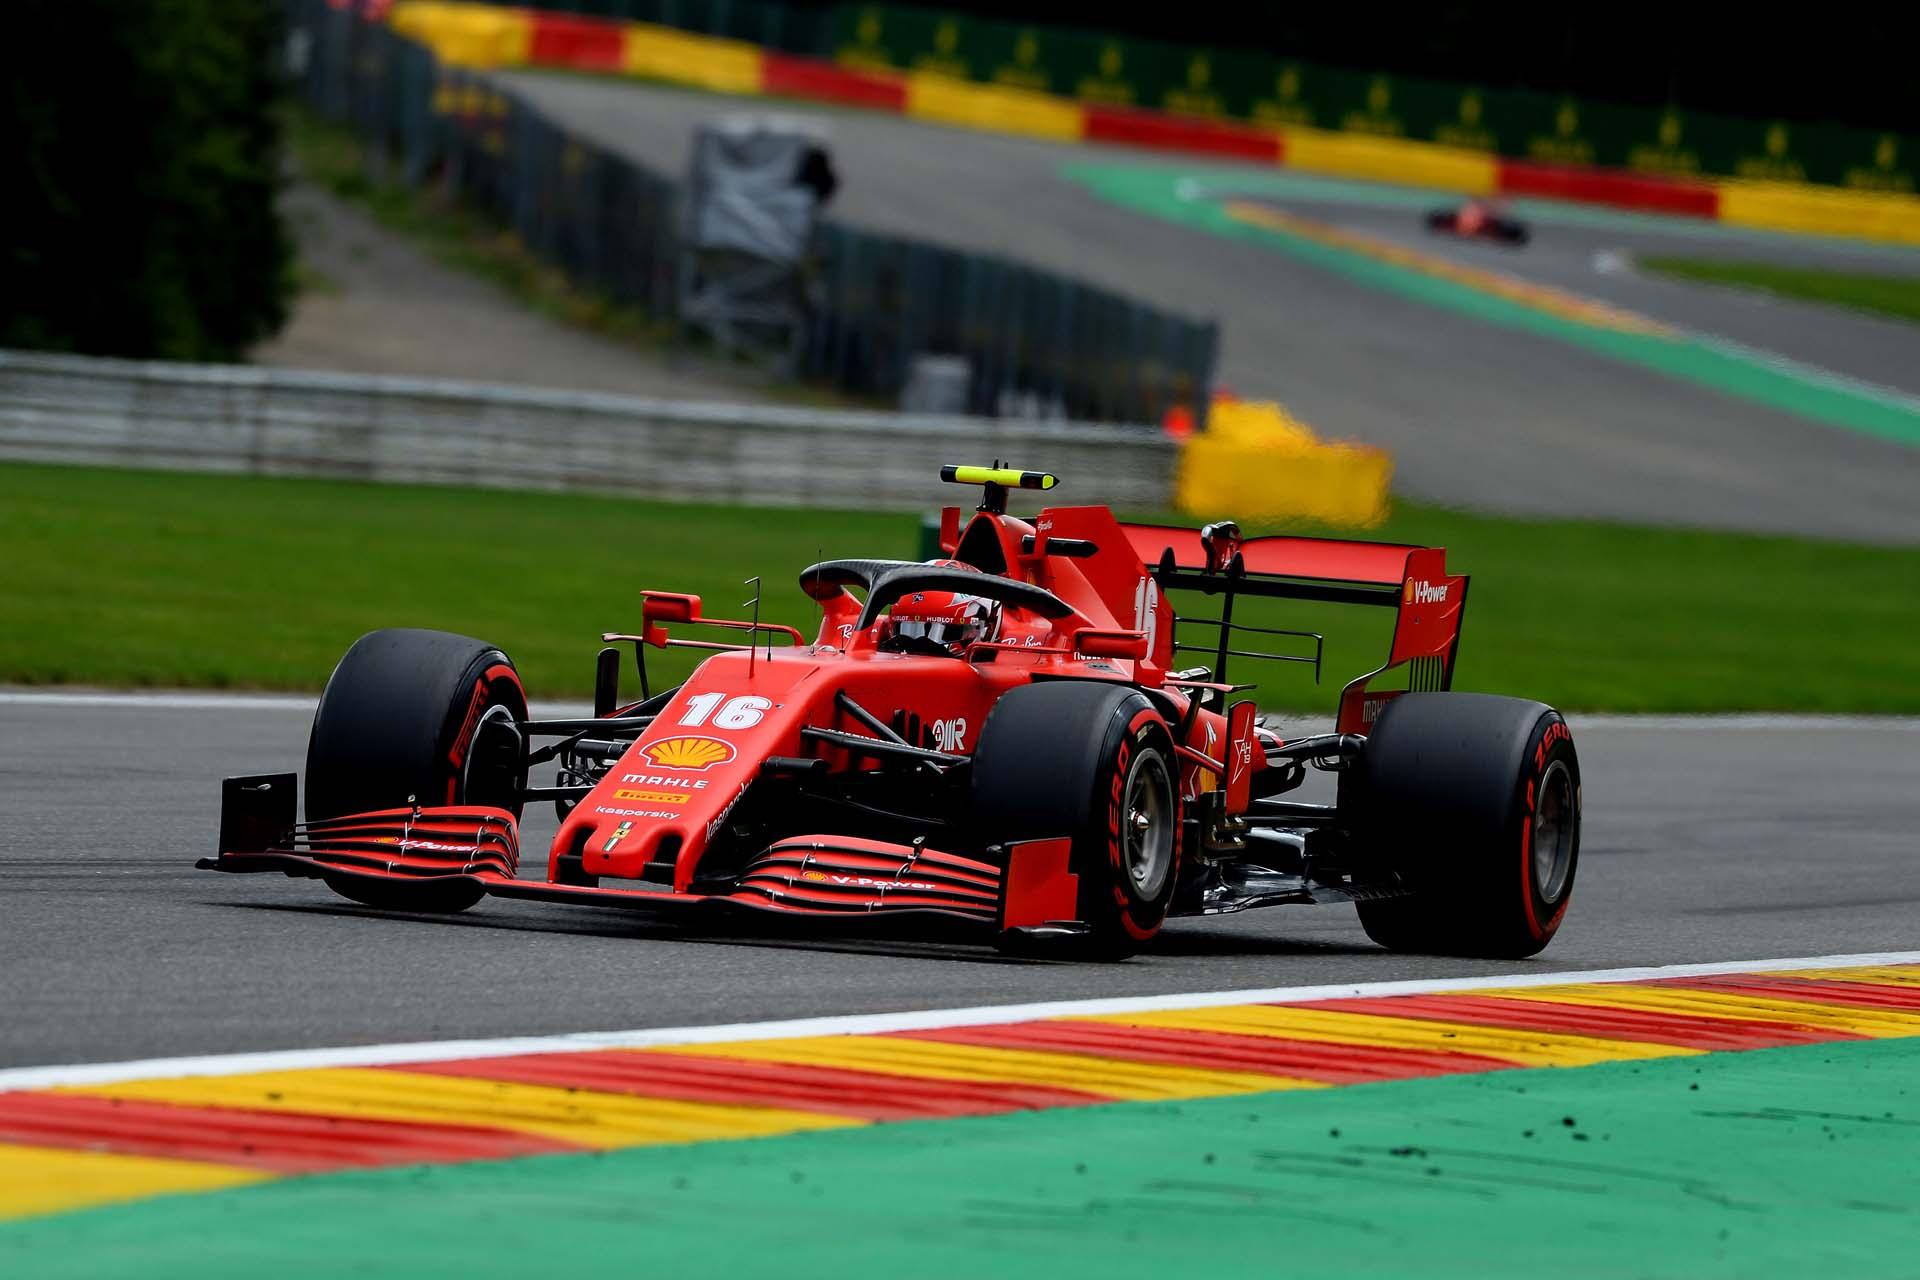 GP BELGIO F1/2020 -  SABATO 29/08/2020